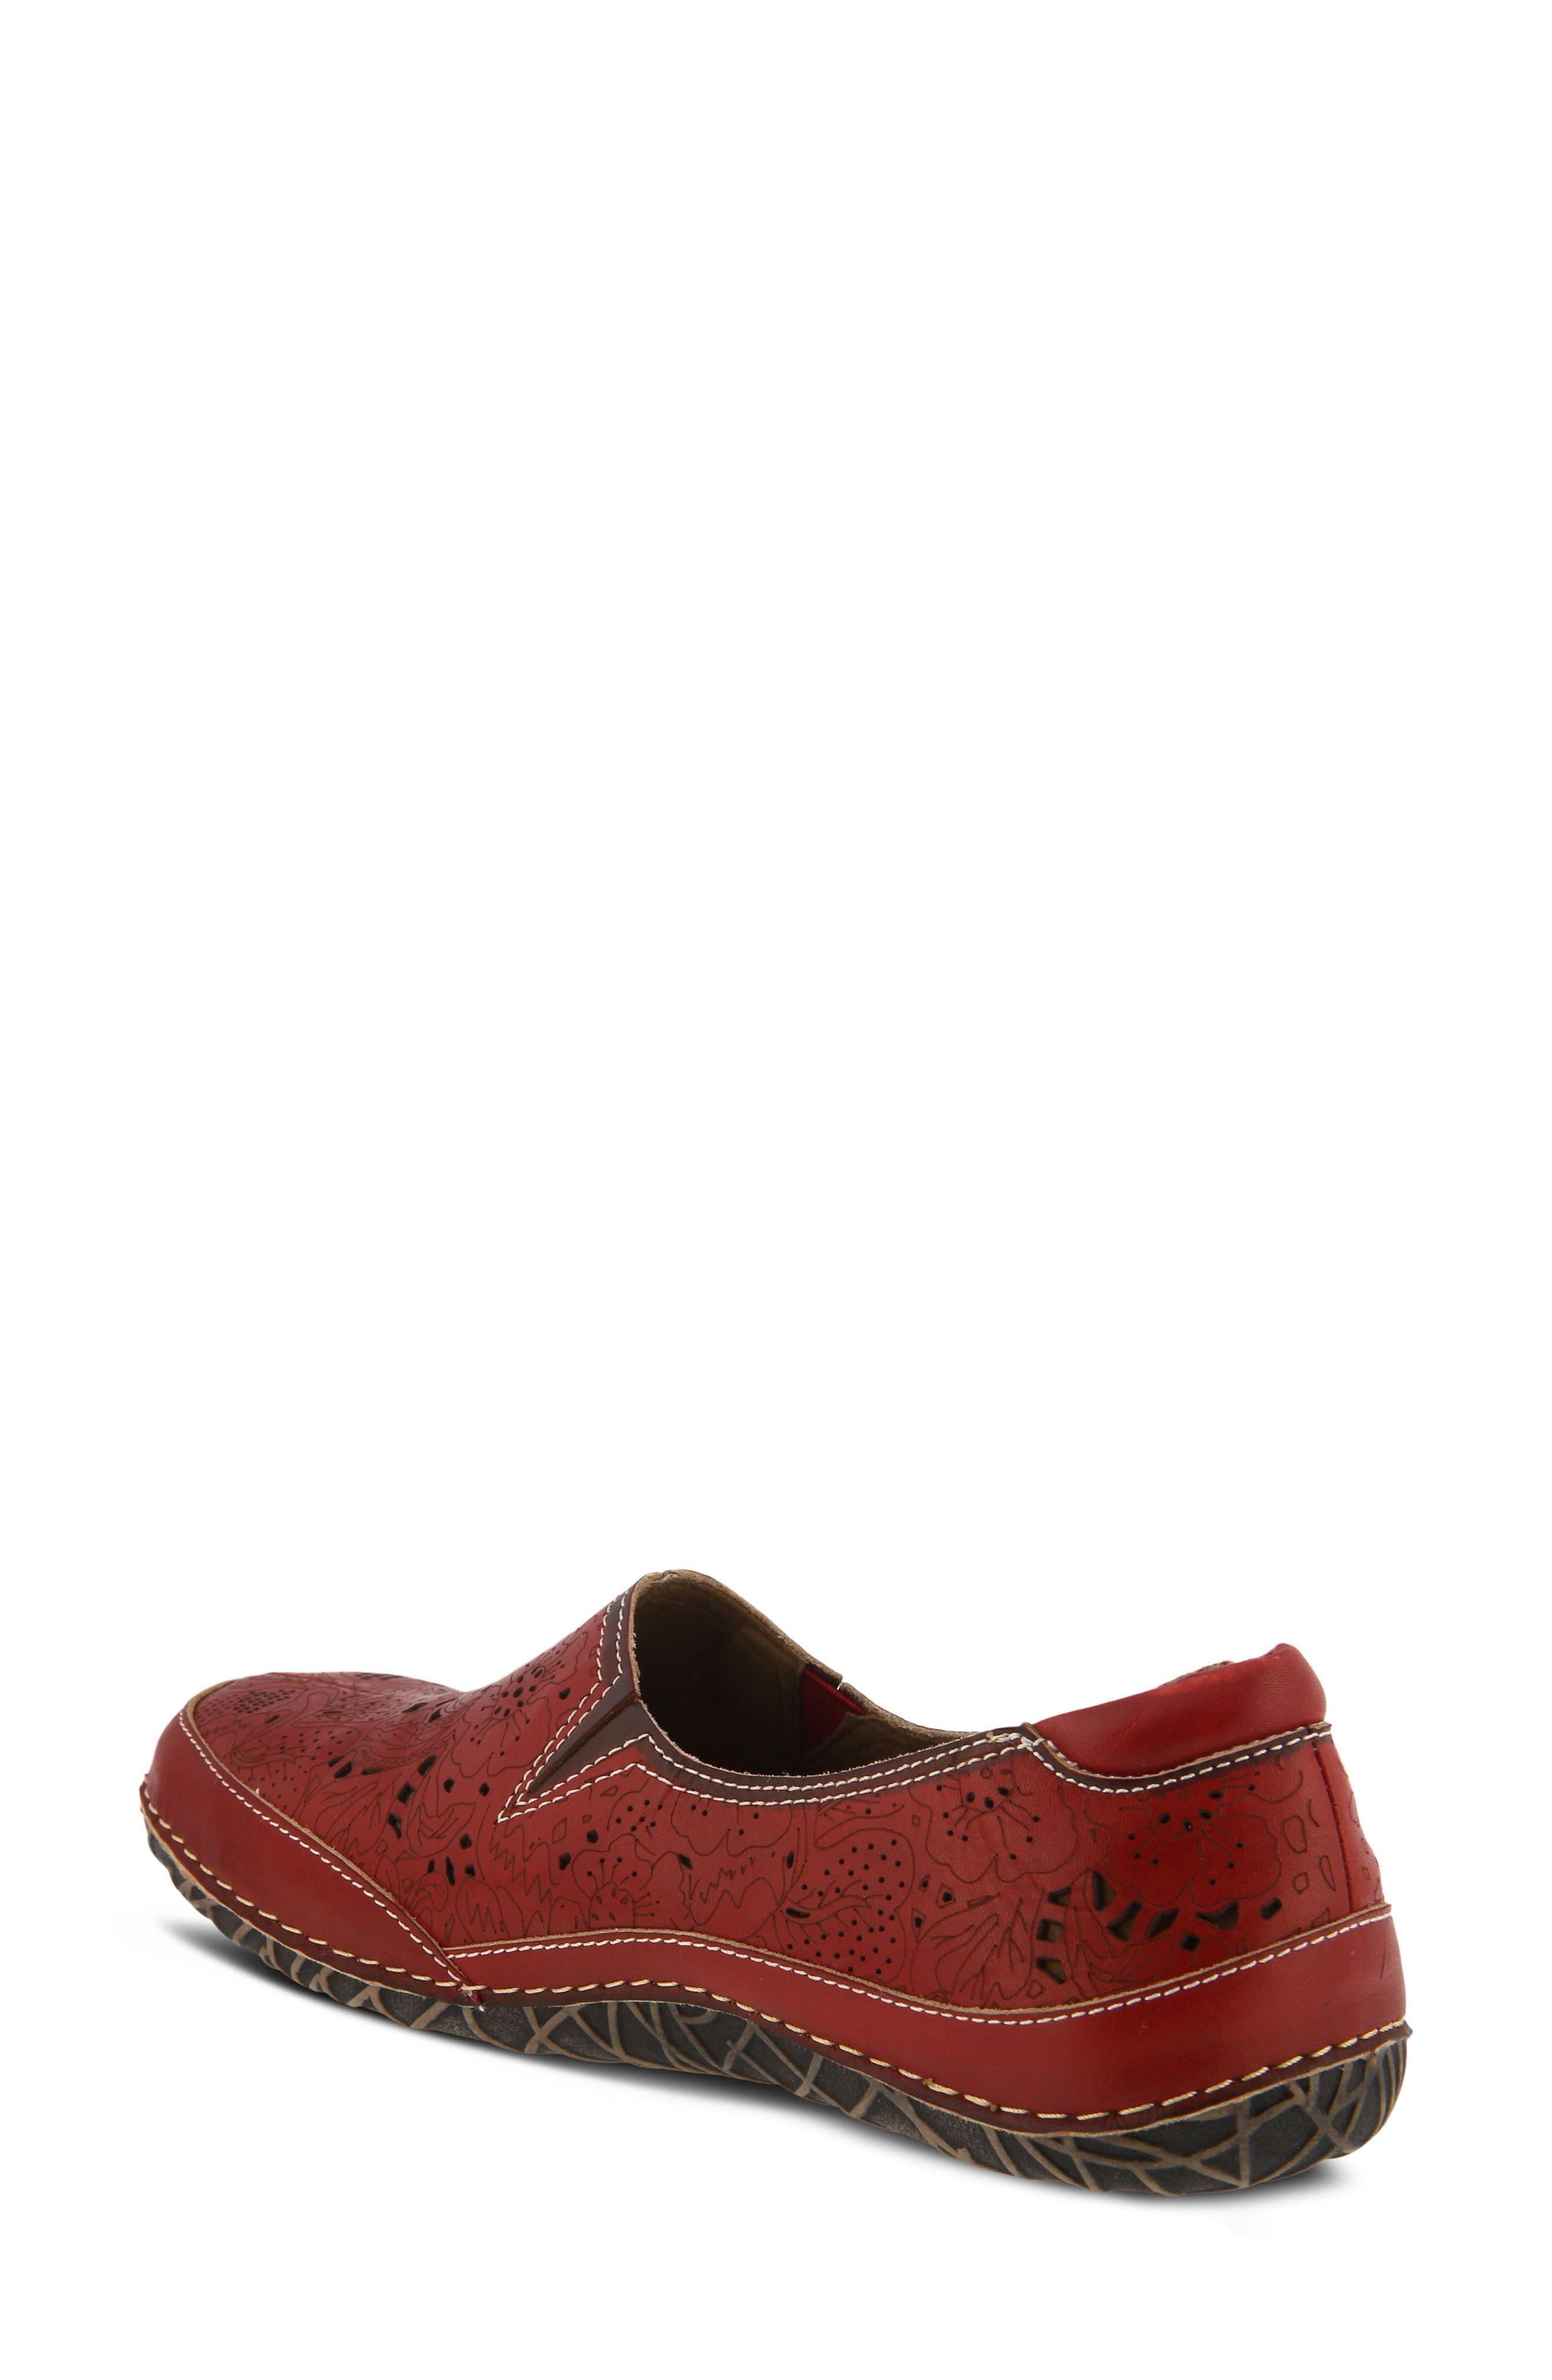 L'Artiste Libora Slip-On Flat,                             Alternate thumbnail 2, color,                             Red Leather